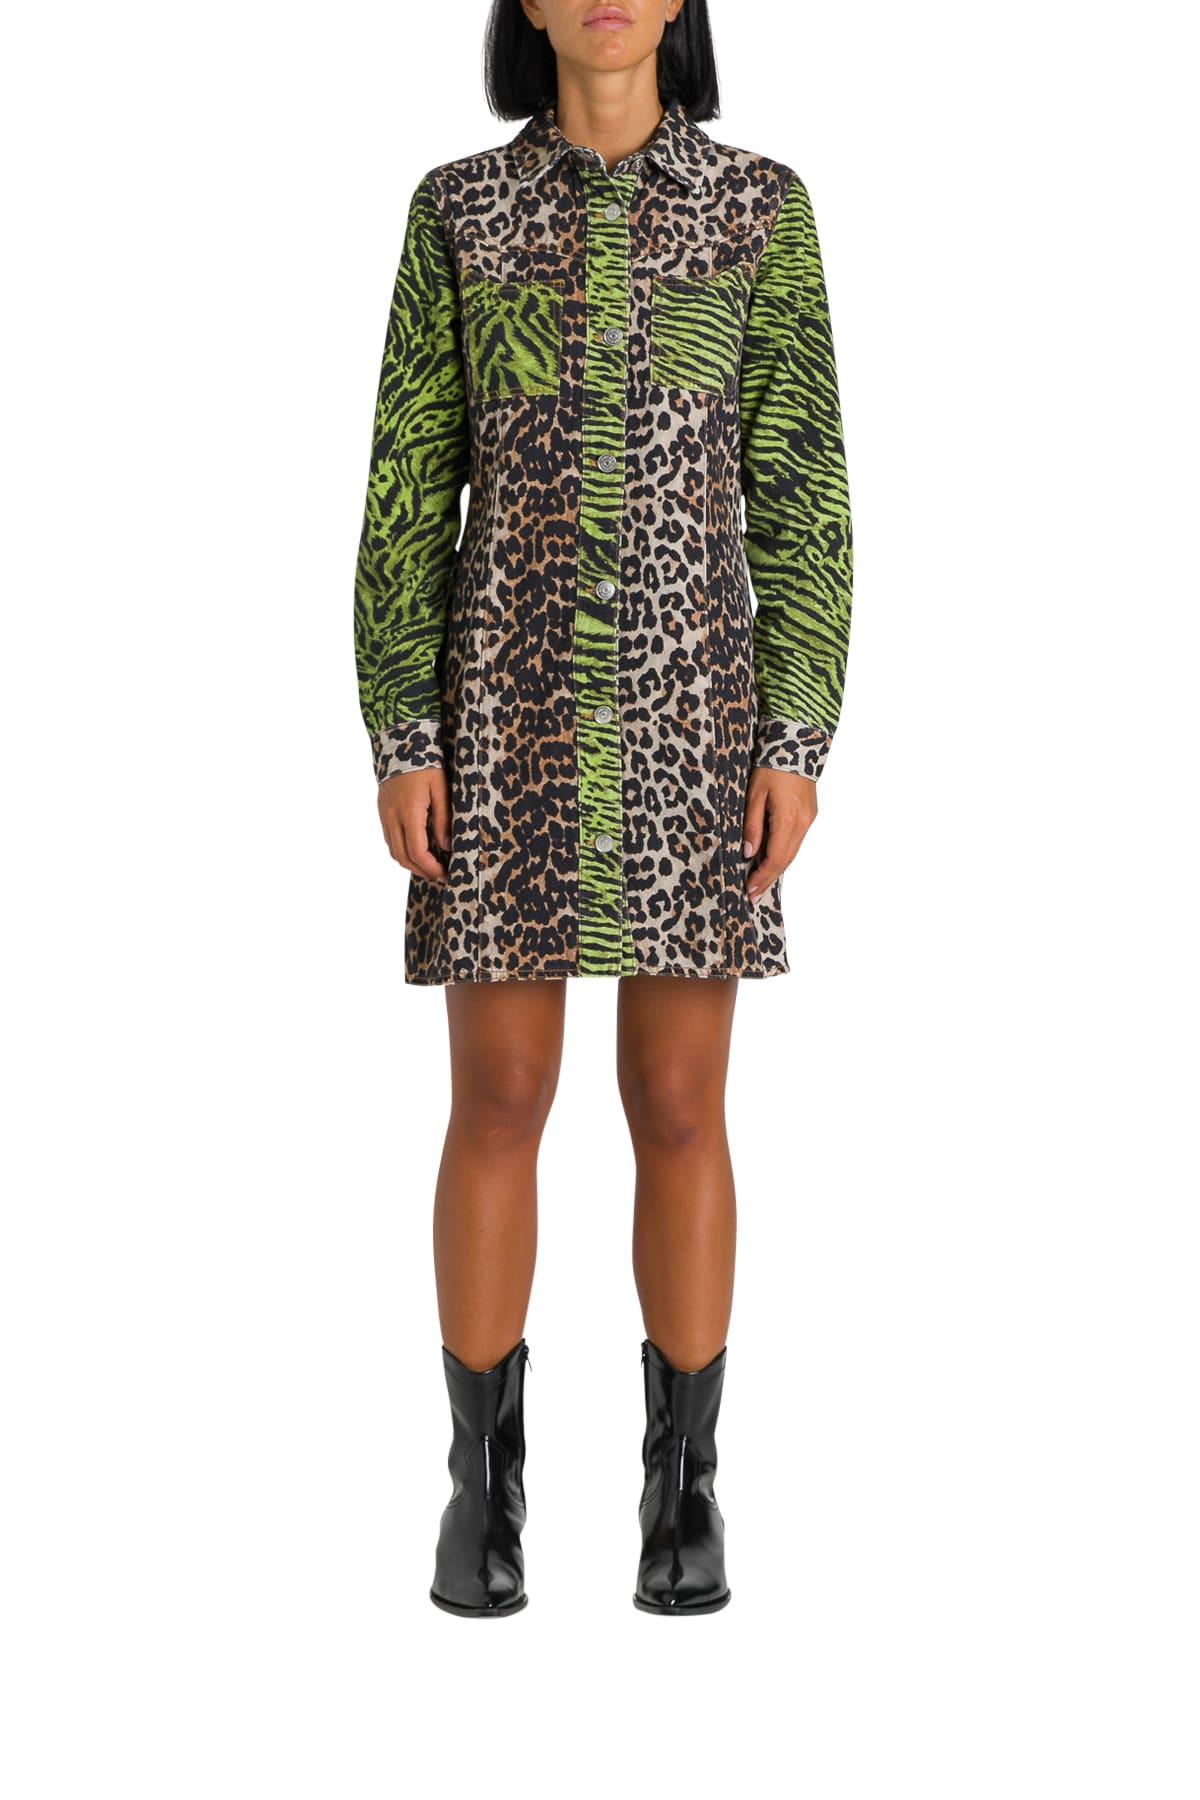 Ganni Animalier Printed Denim Shirt Dress